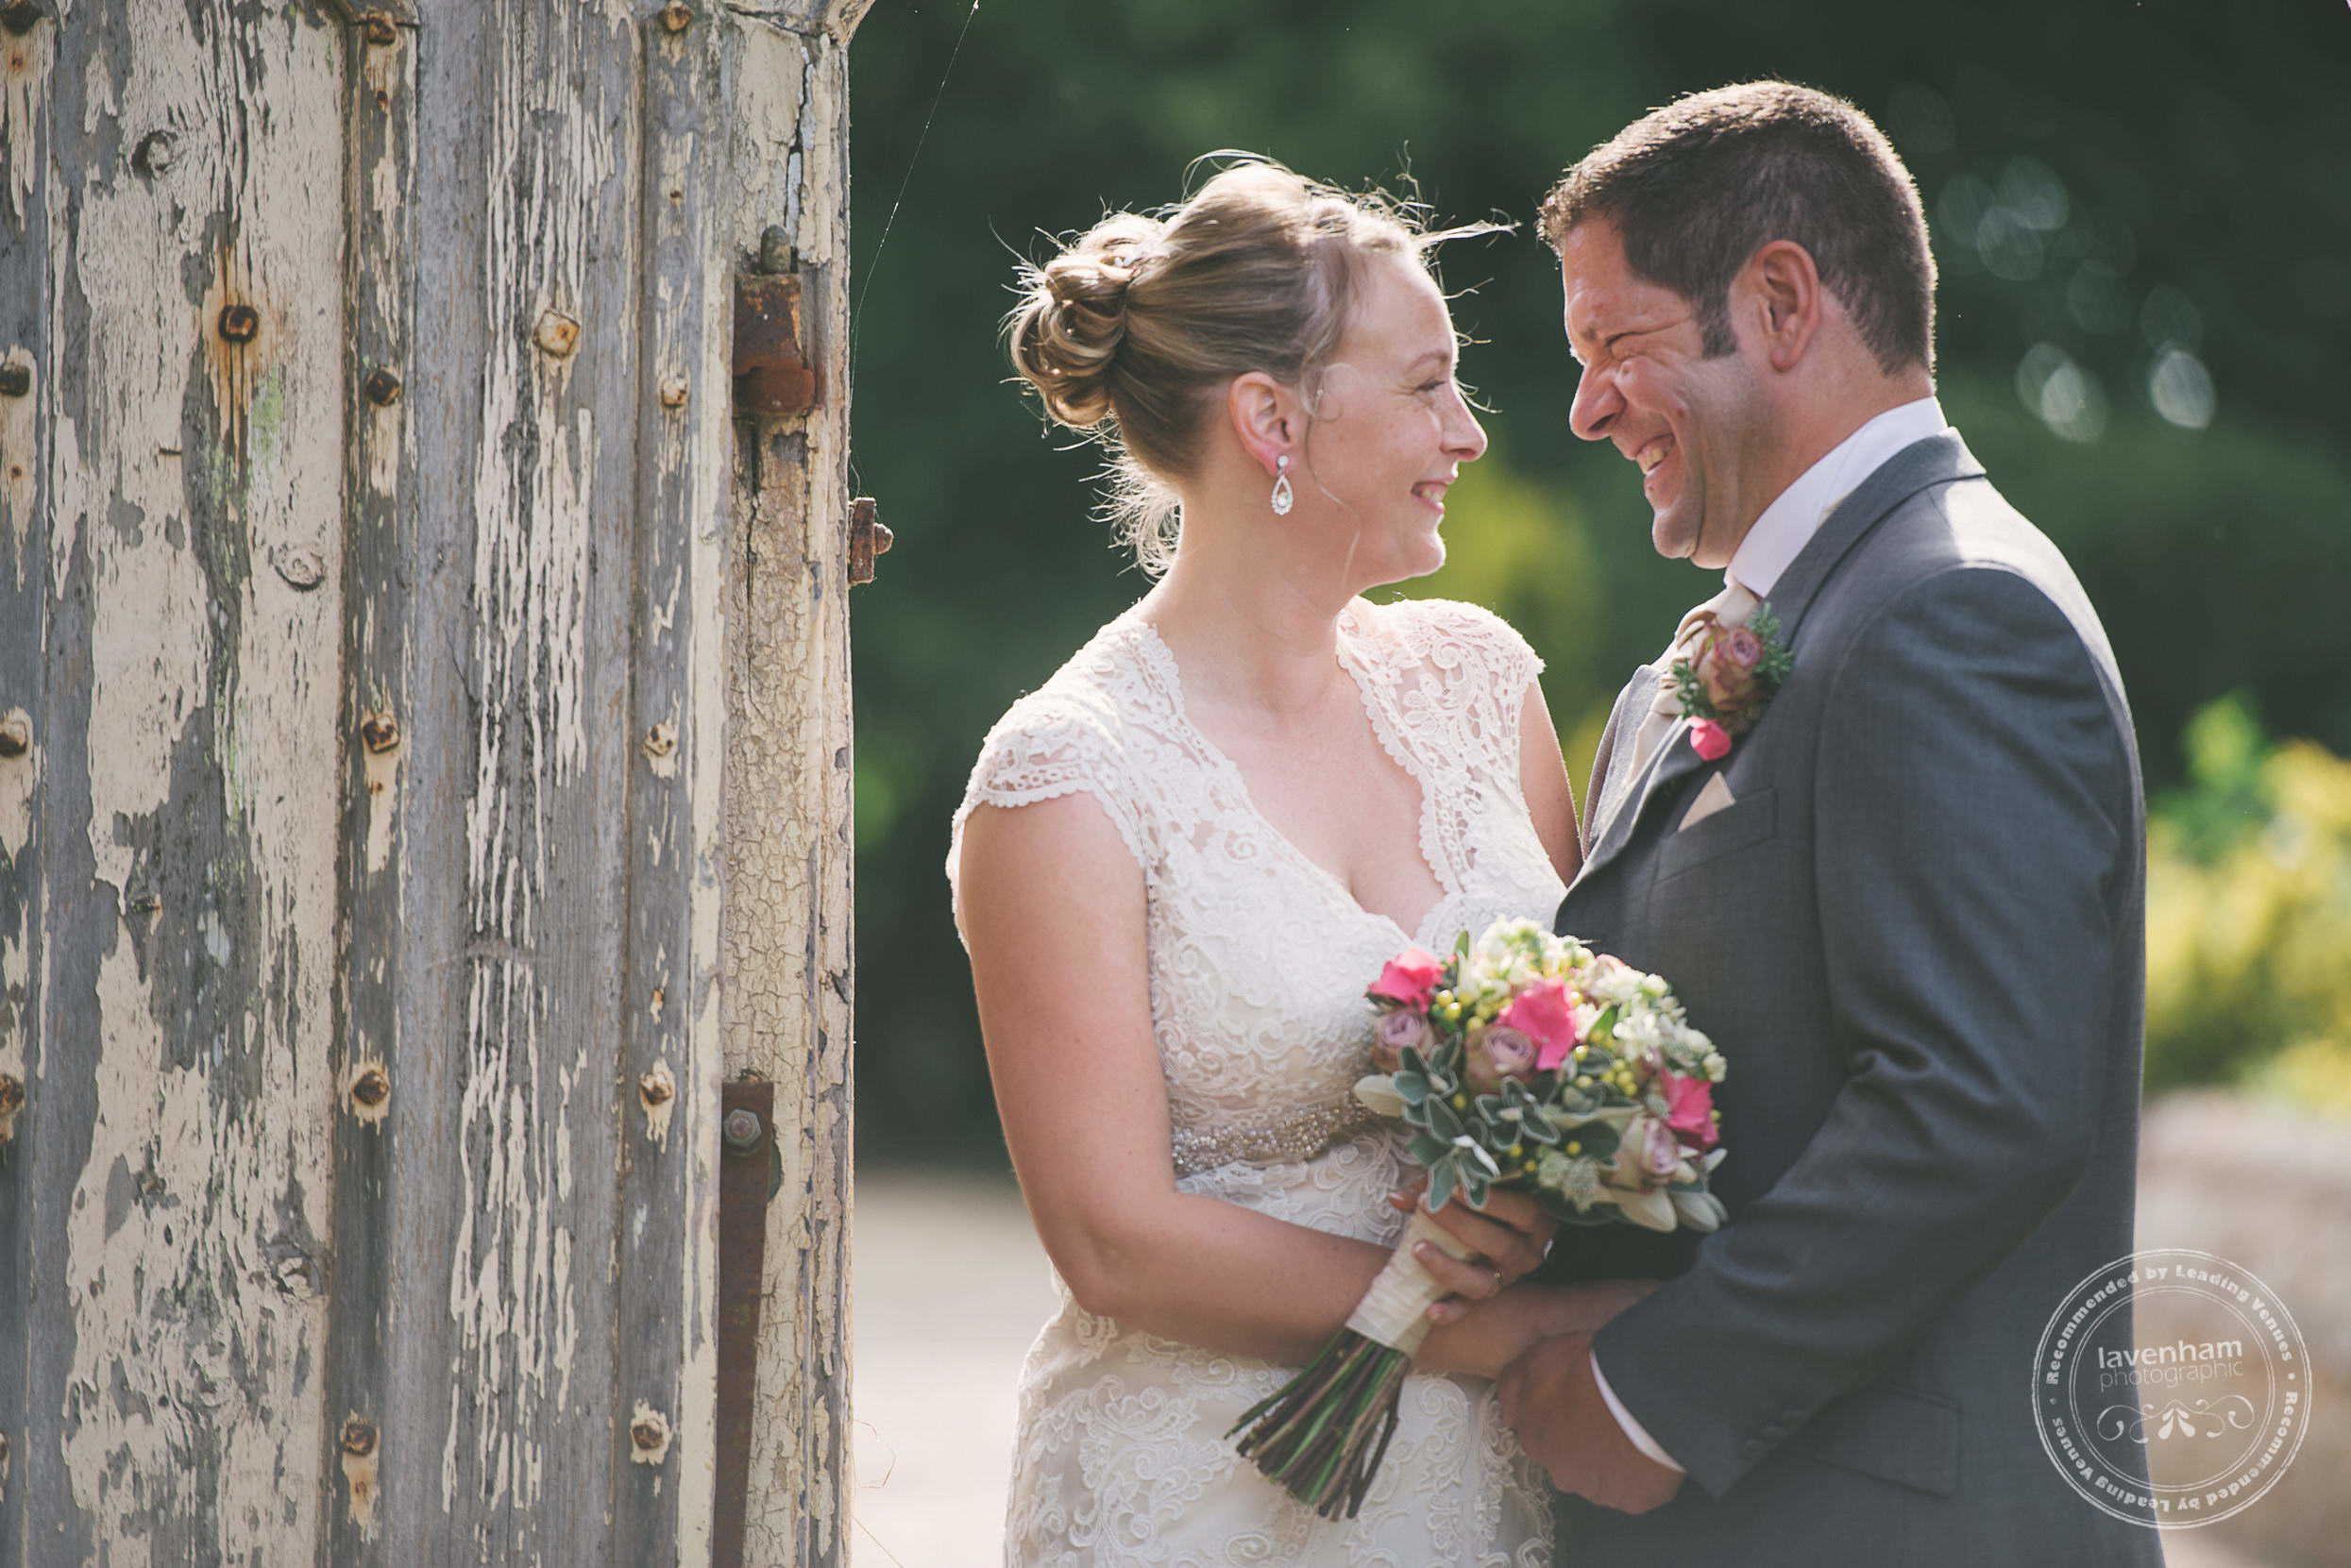 180715-kentwell-hall-wedding-photographer-023